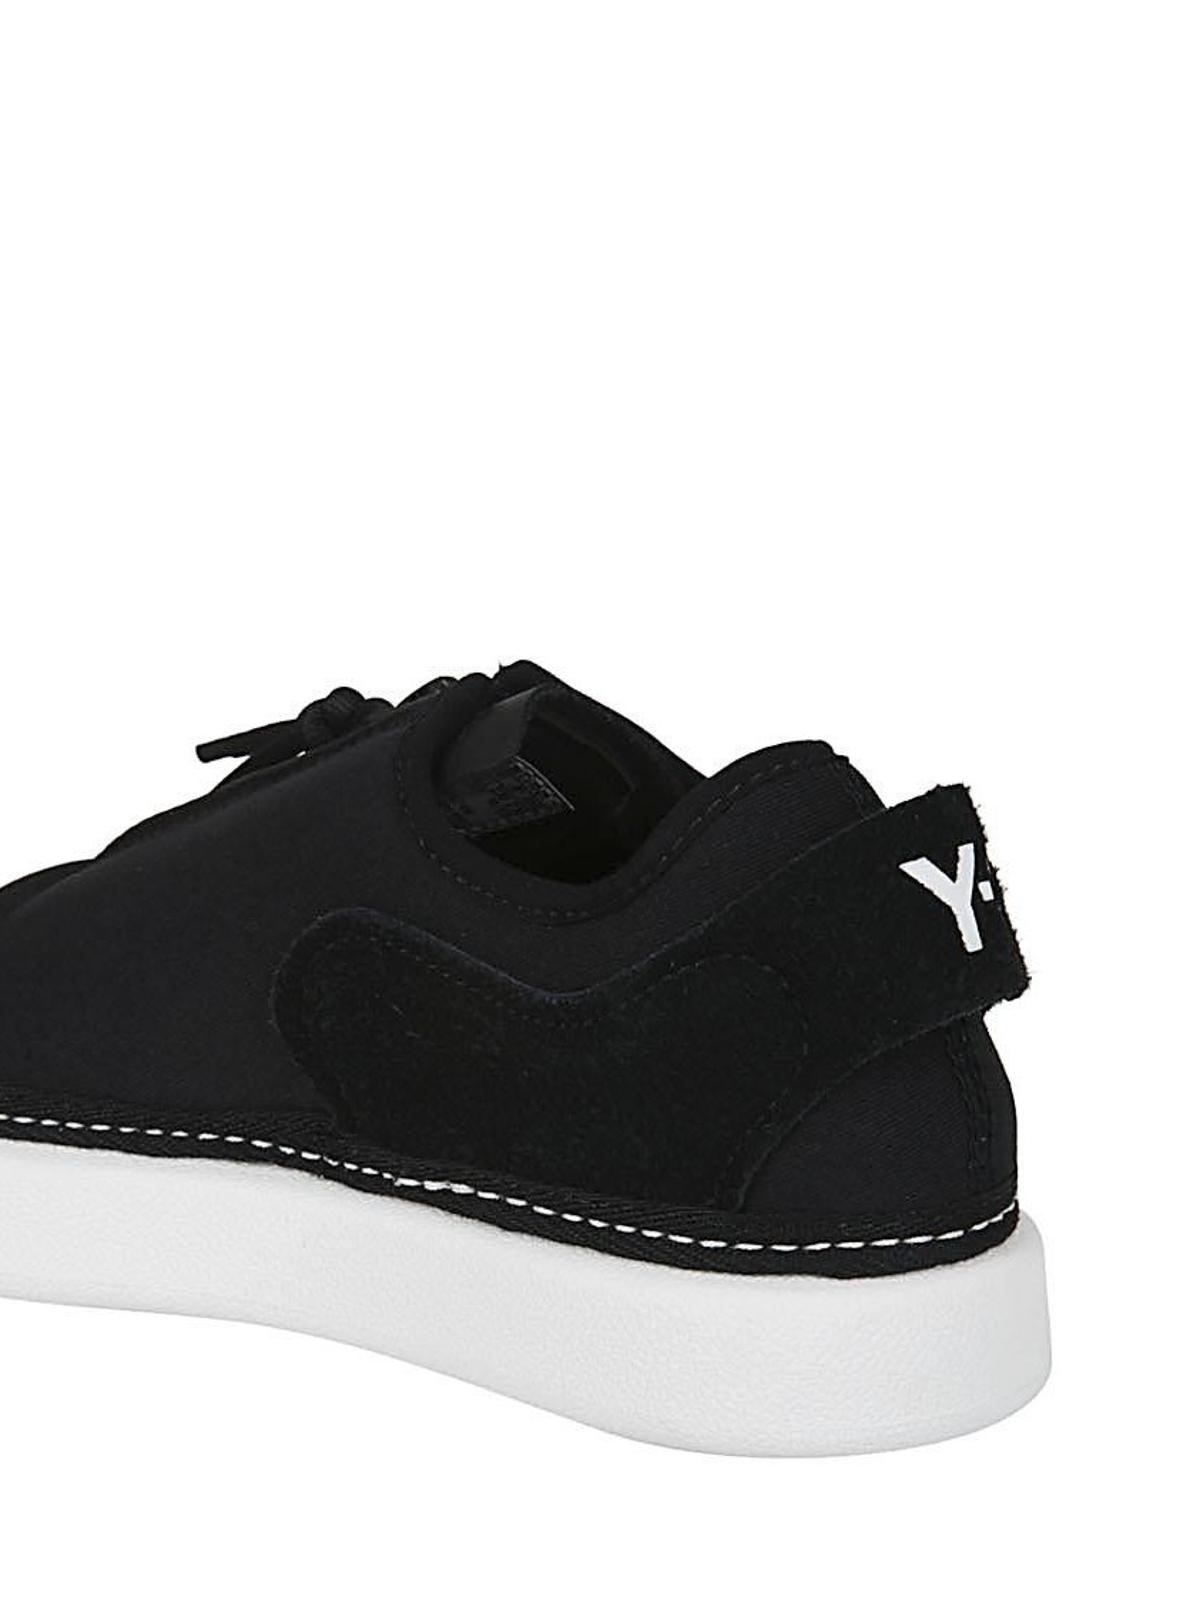 best service 0b787 cdd0a Comfort Zip sneakers shop online  ADIDAS Y-3